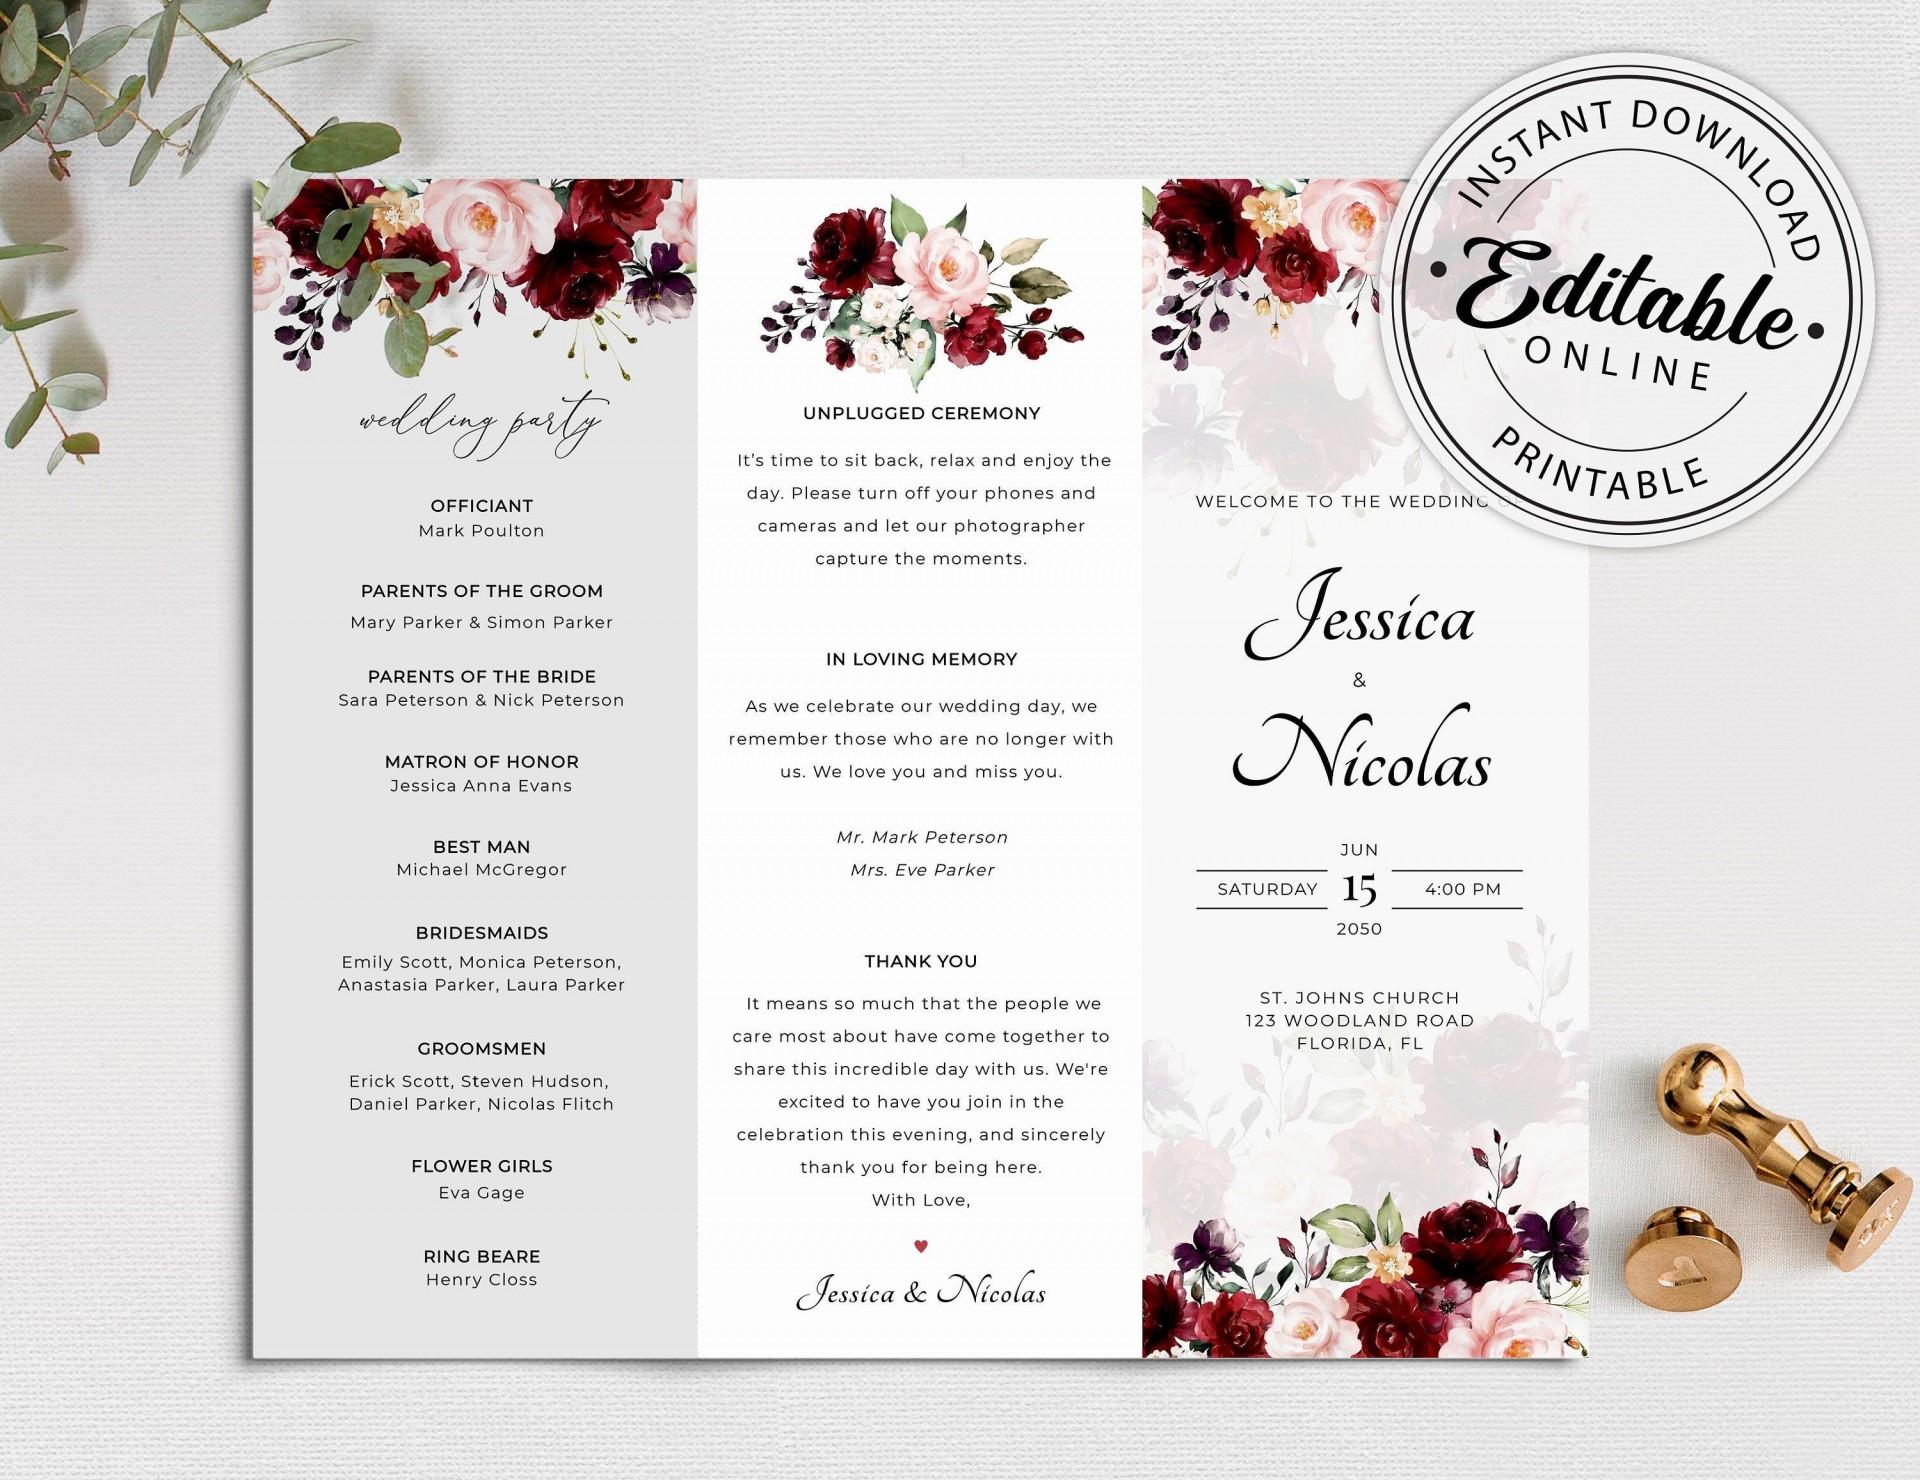 005 Formidable Trifold Wedding Program Template Inspiration  Templates Tri Fold Tri-fold Publisher Free Foldable1920